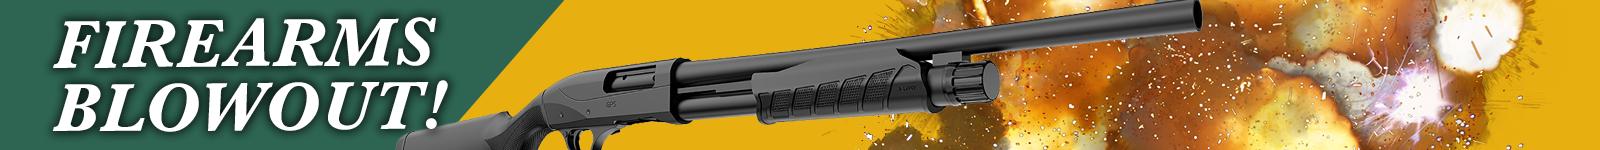 5992-ko-firearmsblowout-web3.png